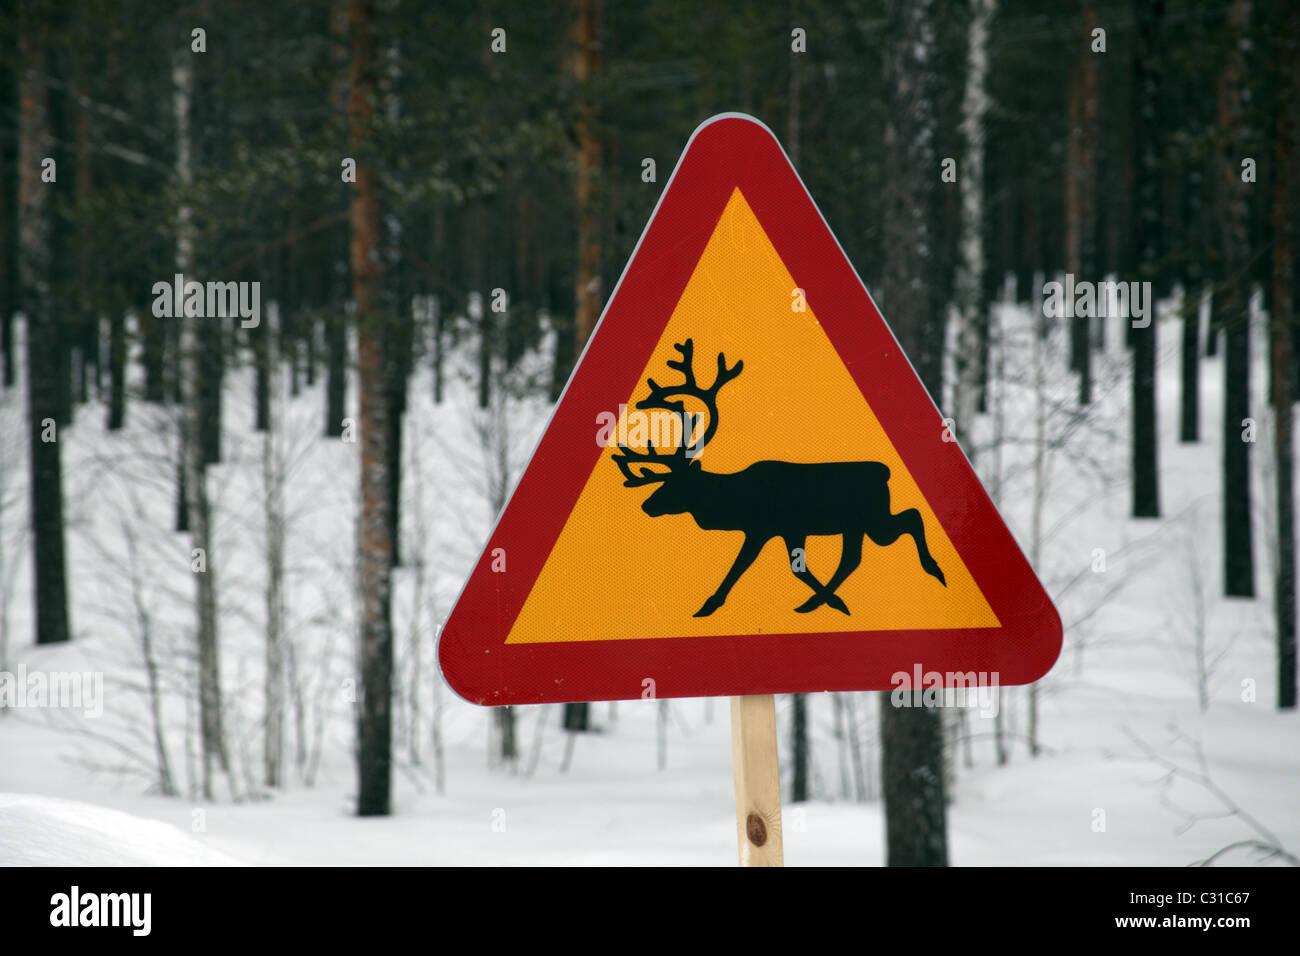 Beware of Elk sign on Swedish Road near Arvidsjaur, northern Sweden - Stock Image